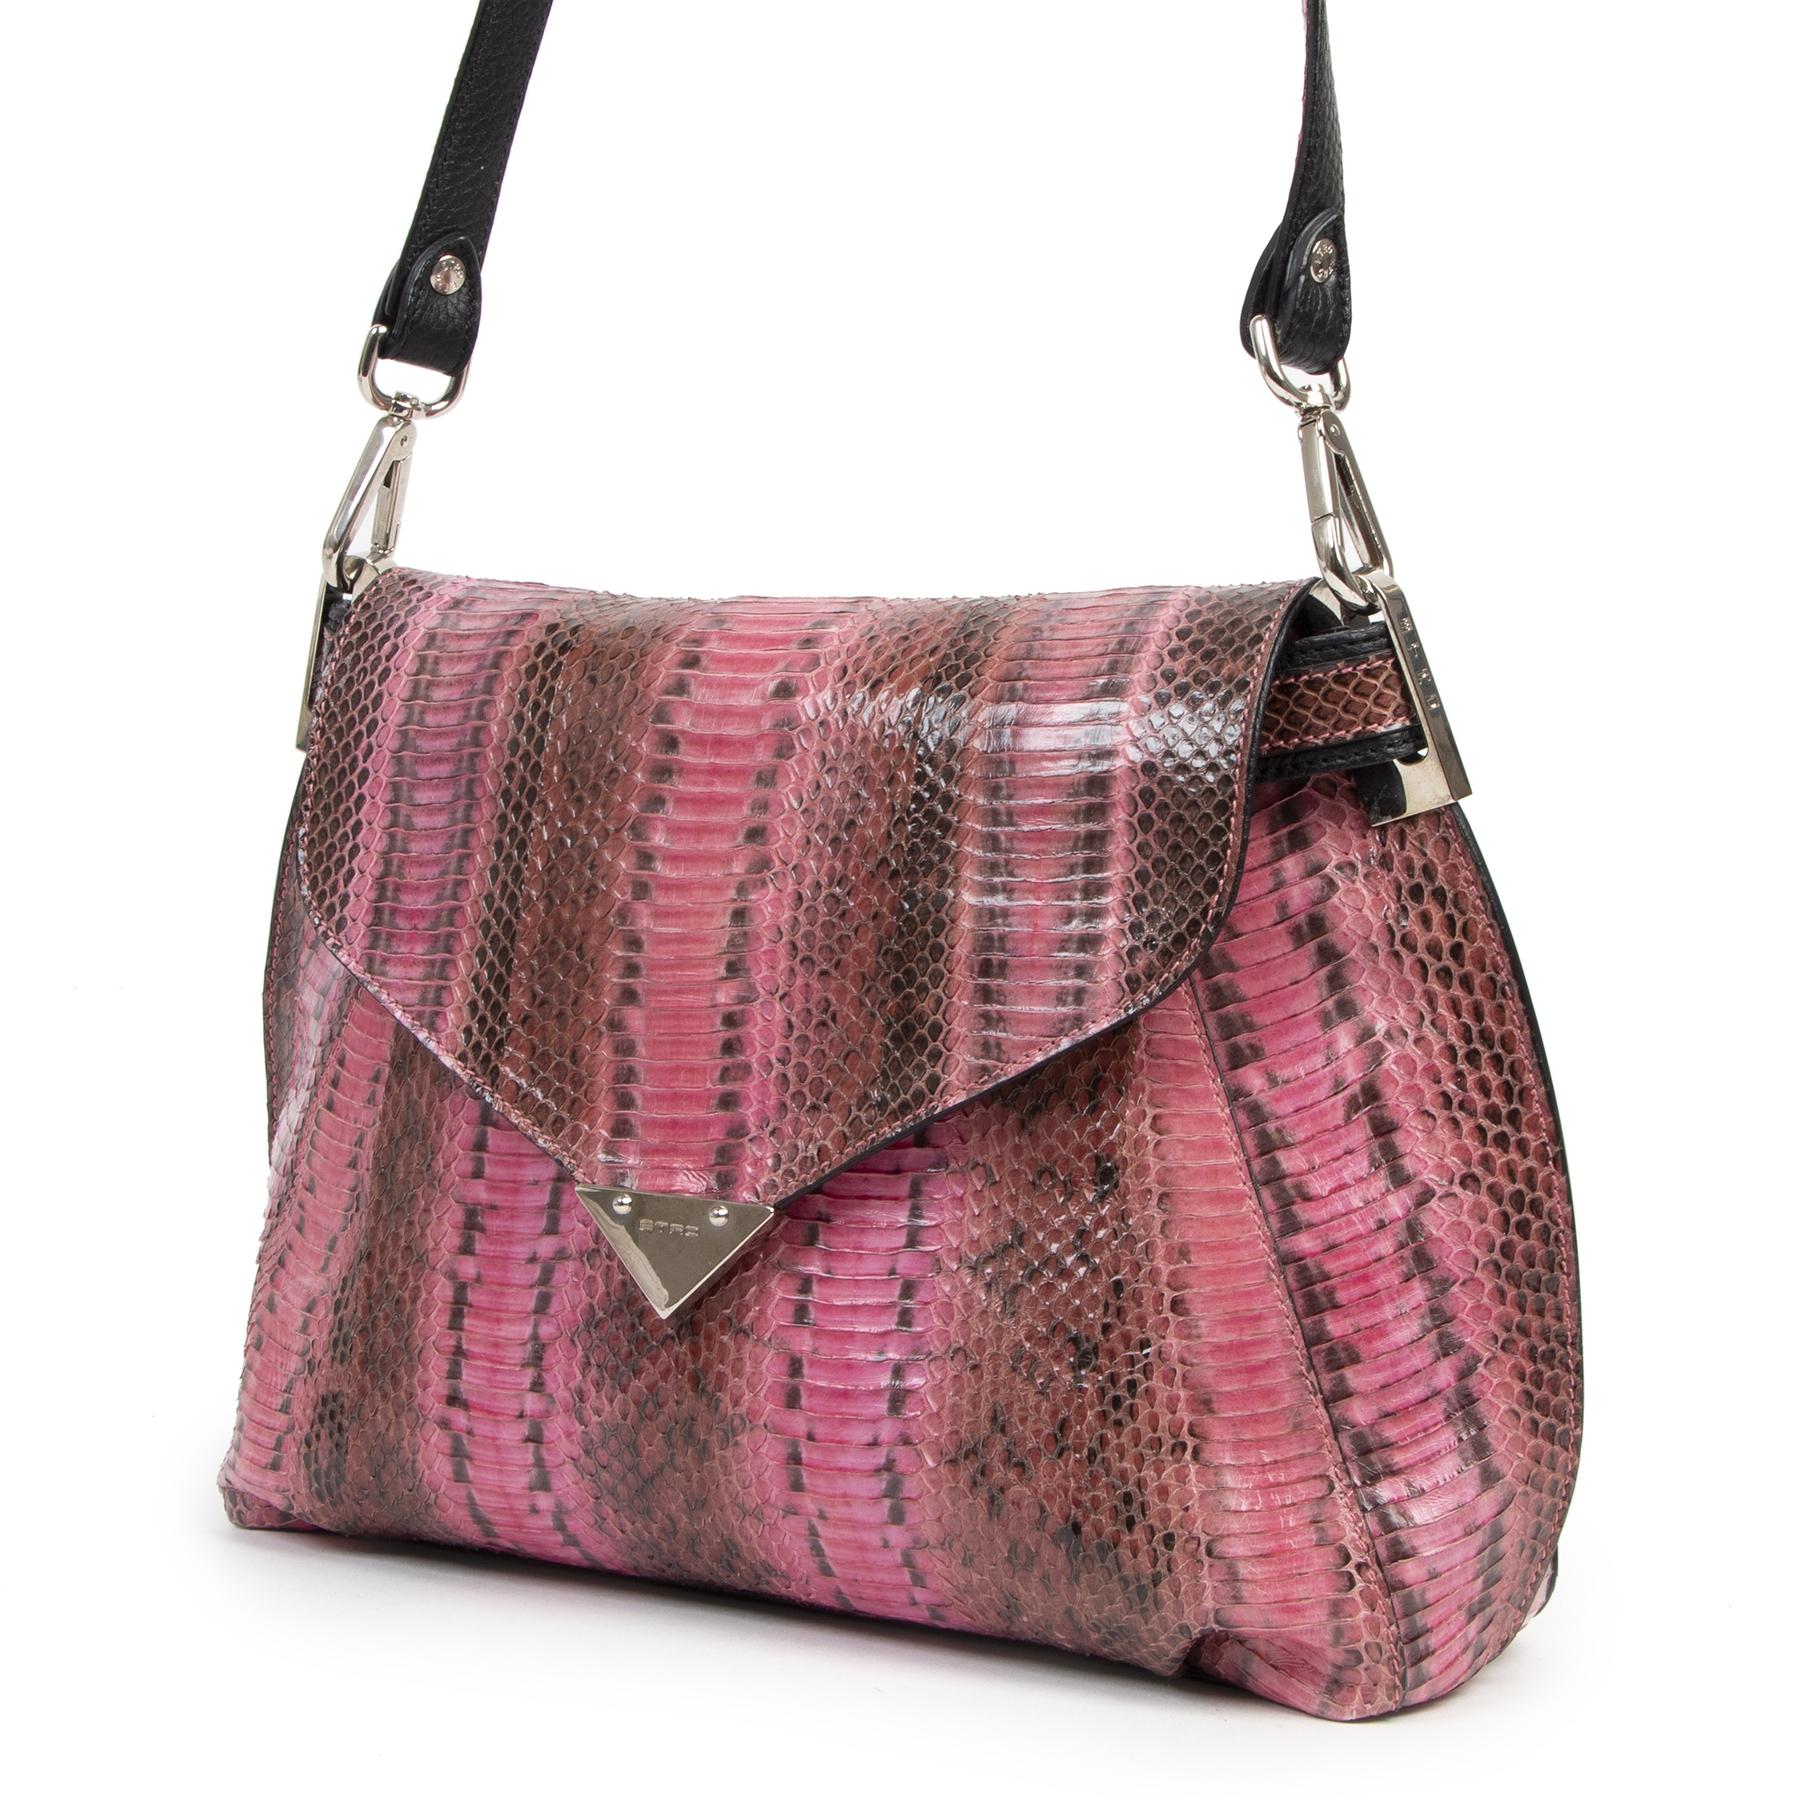 Authentieke tweedehands vintage Etro Pink Python Crossbody Bag koop online webshop LabelLOV